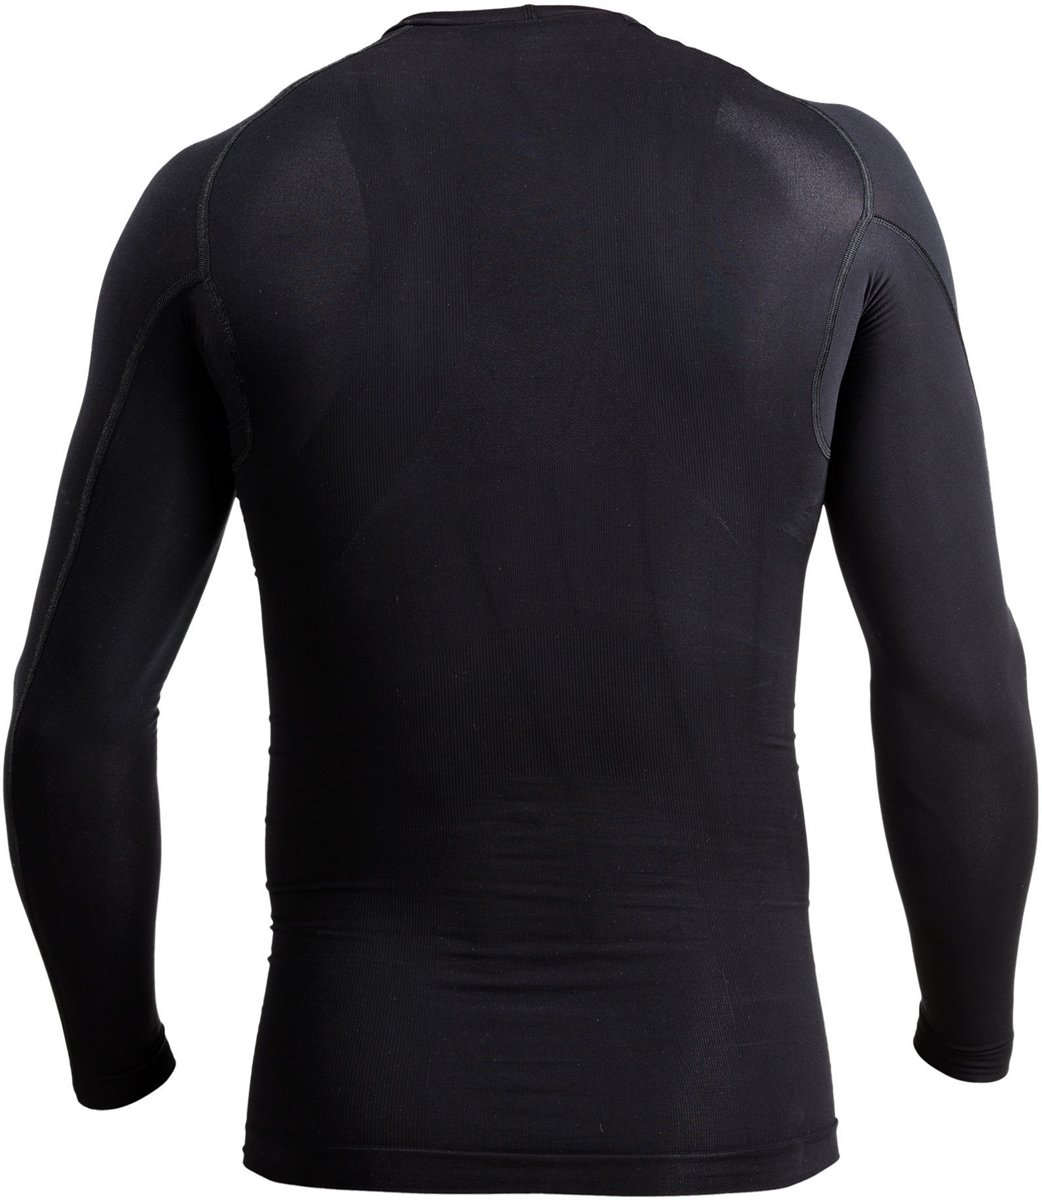 new concept 525a9 8ef7d bol.com  Knapman Thermo Active Compressie Longsleeve Shirt Heren  Sportshirt - Maat M - Mannen.